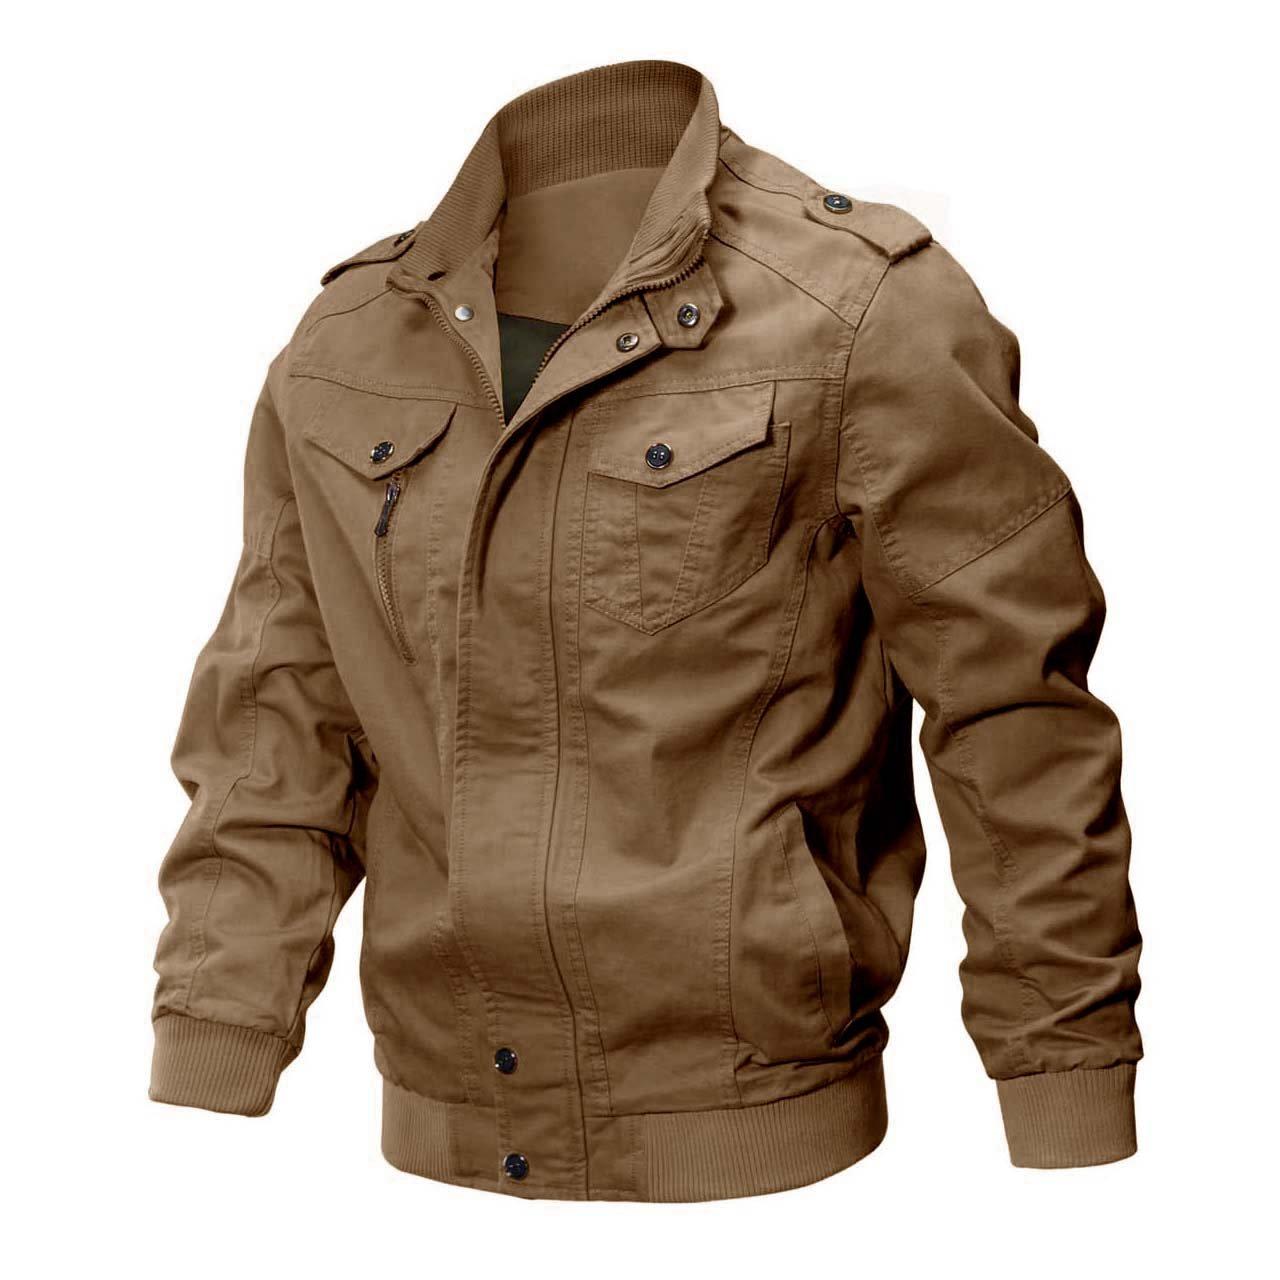 CRYSULLY Mens Spring Fall Casual Windbreaker Jacket Cargo Stand Collar Military Bomber Jackets Coat